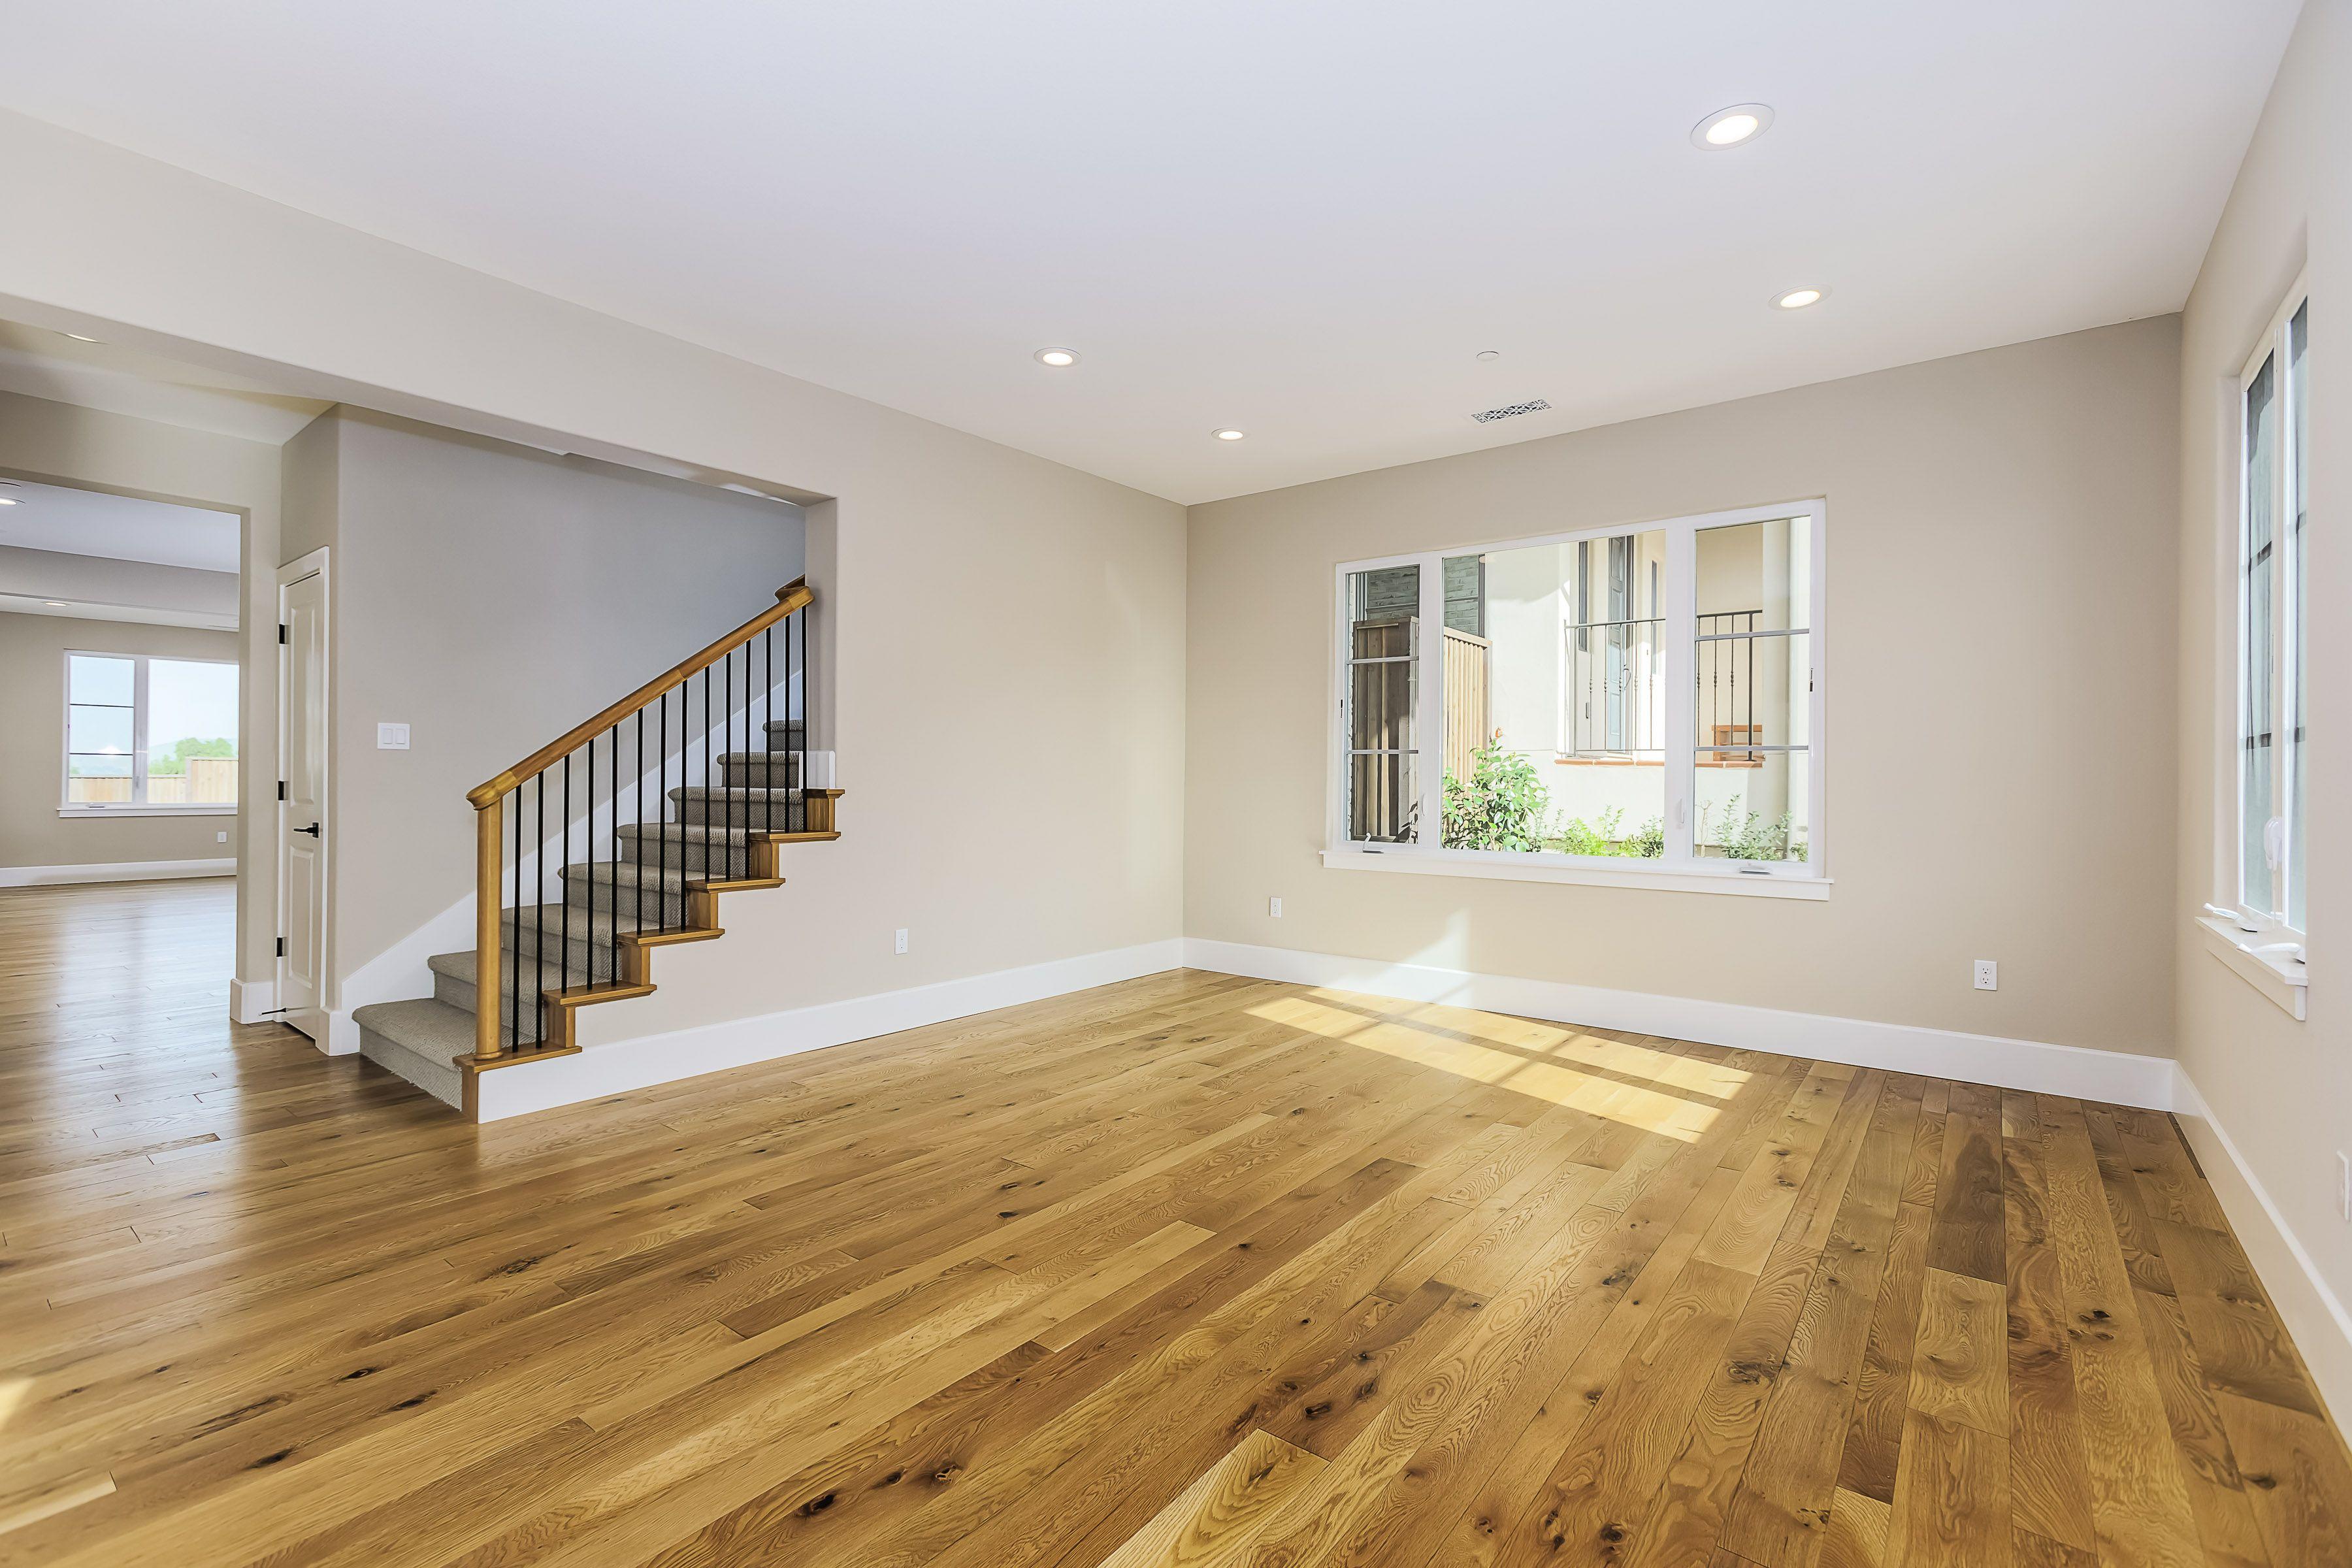 Robson homes plans